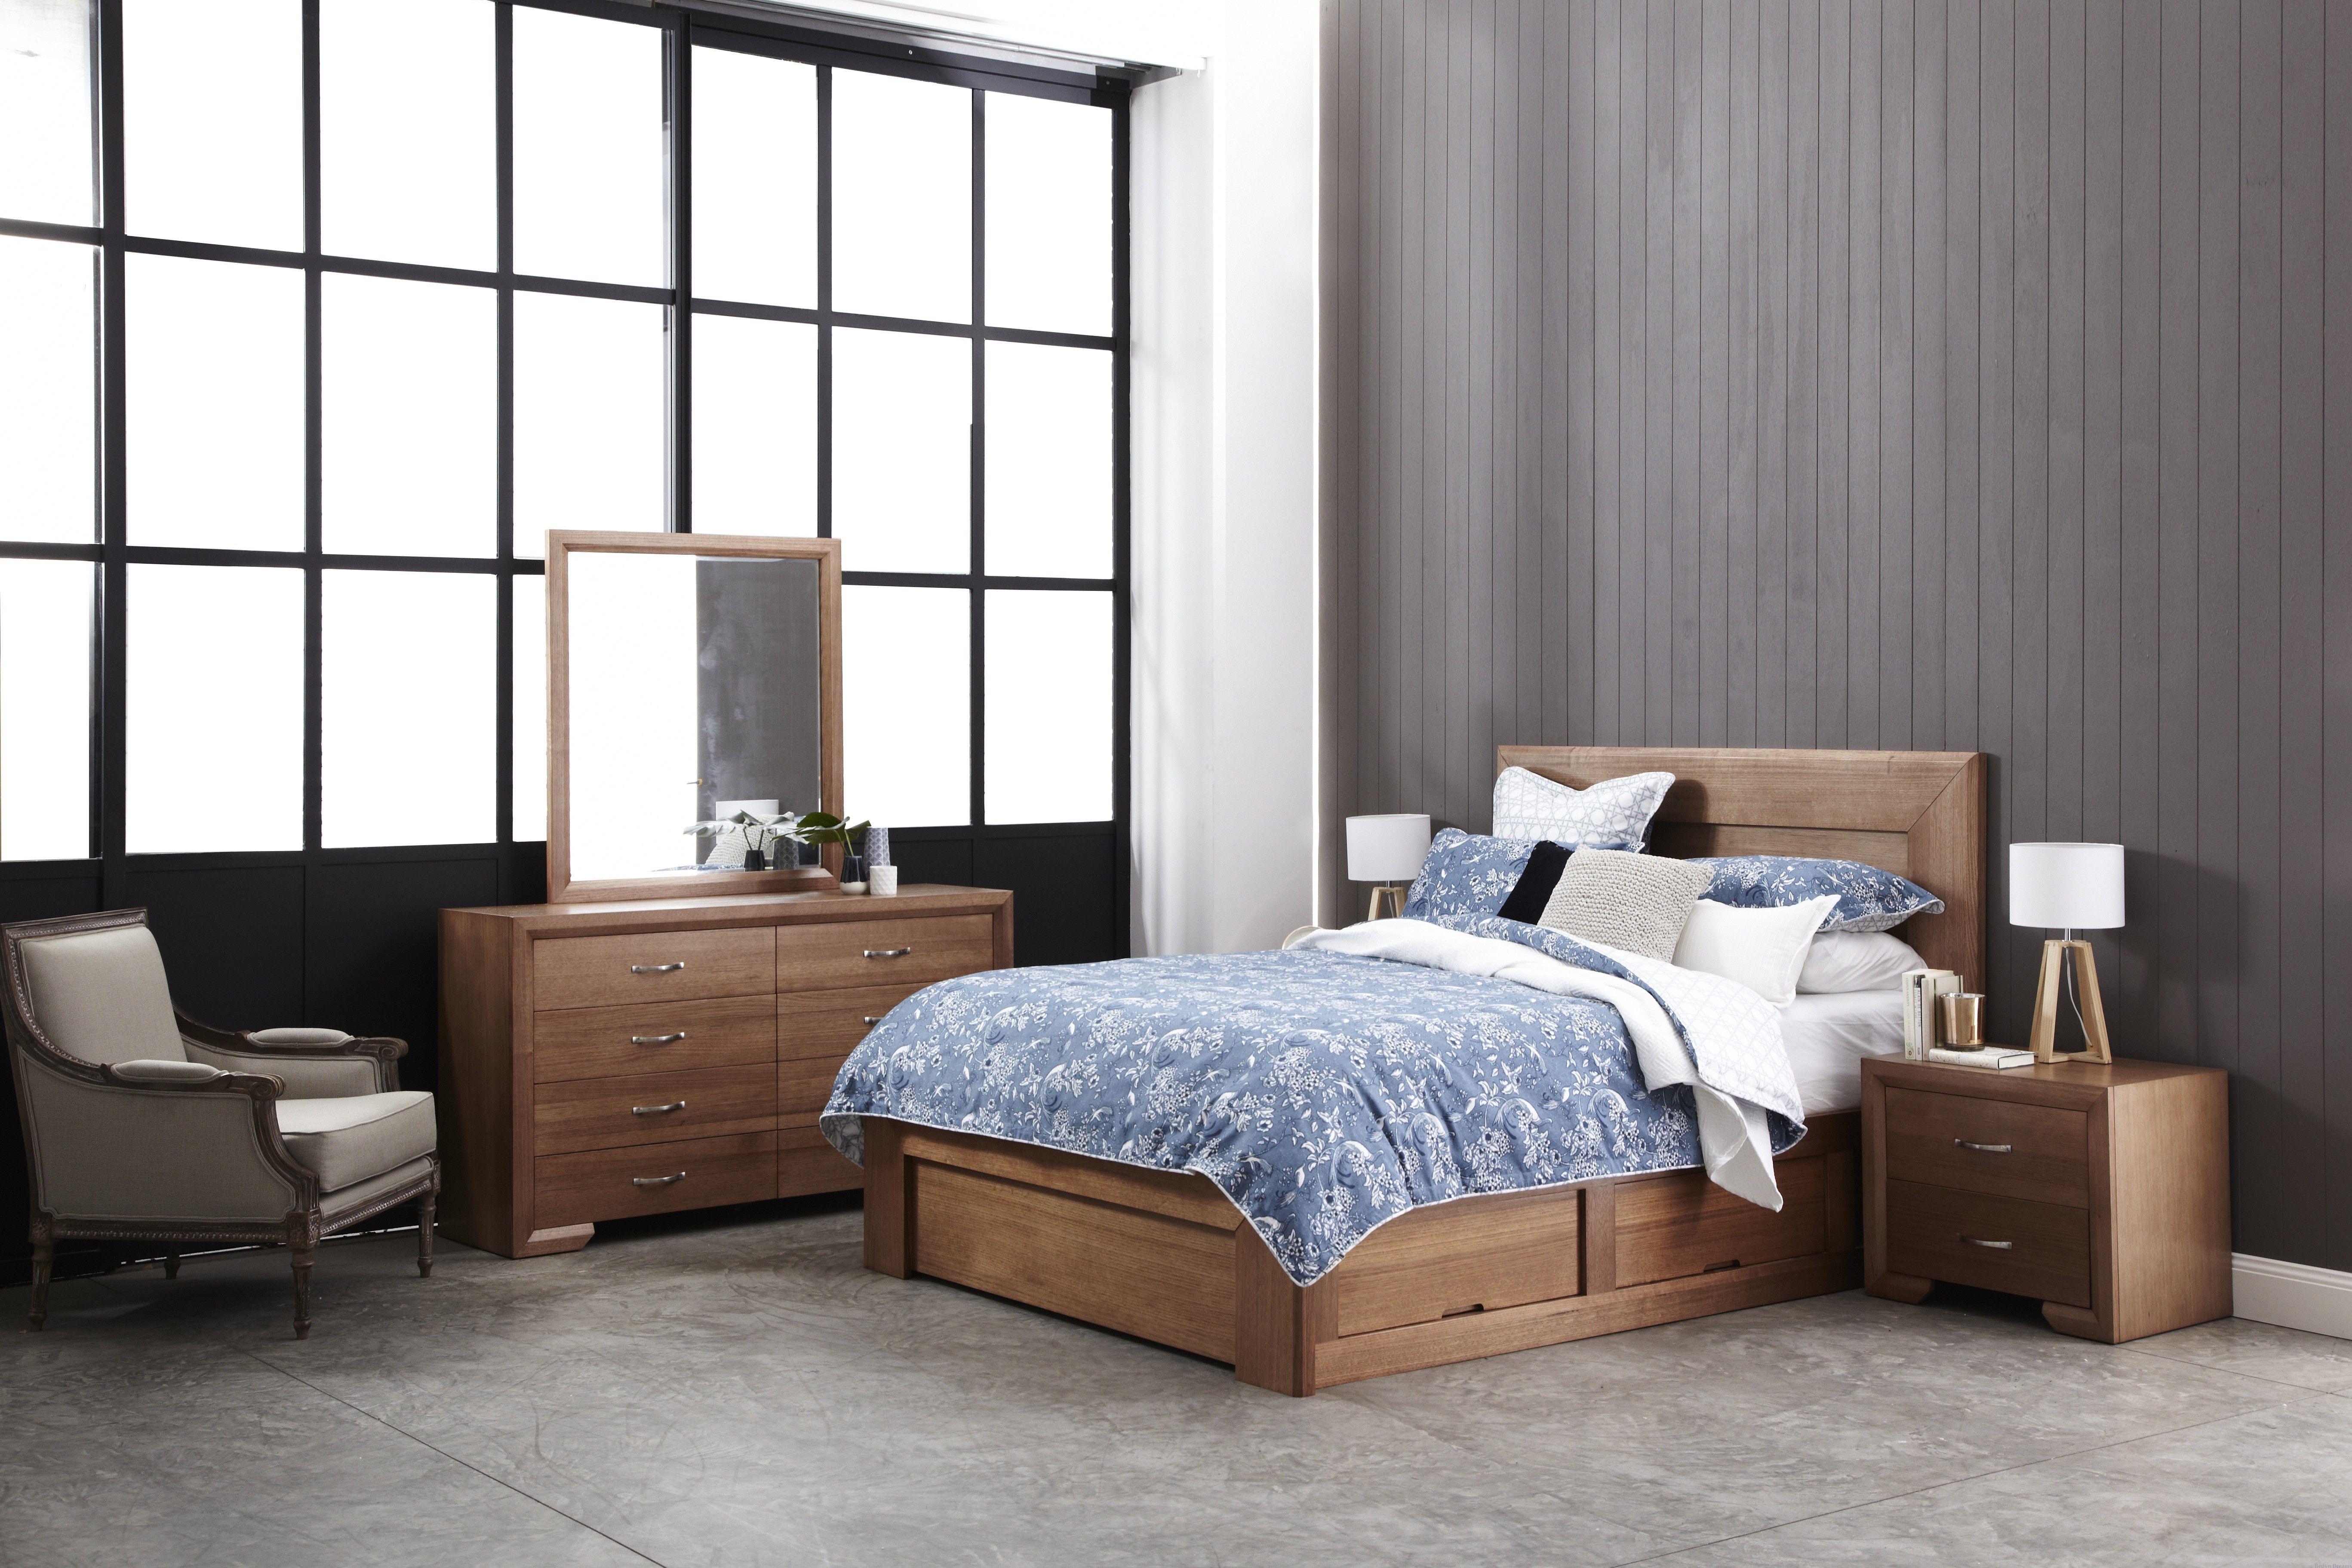 Mudo Concept | #104 maison-bedroom | Pinterest | Bedrooms